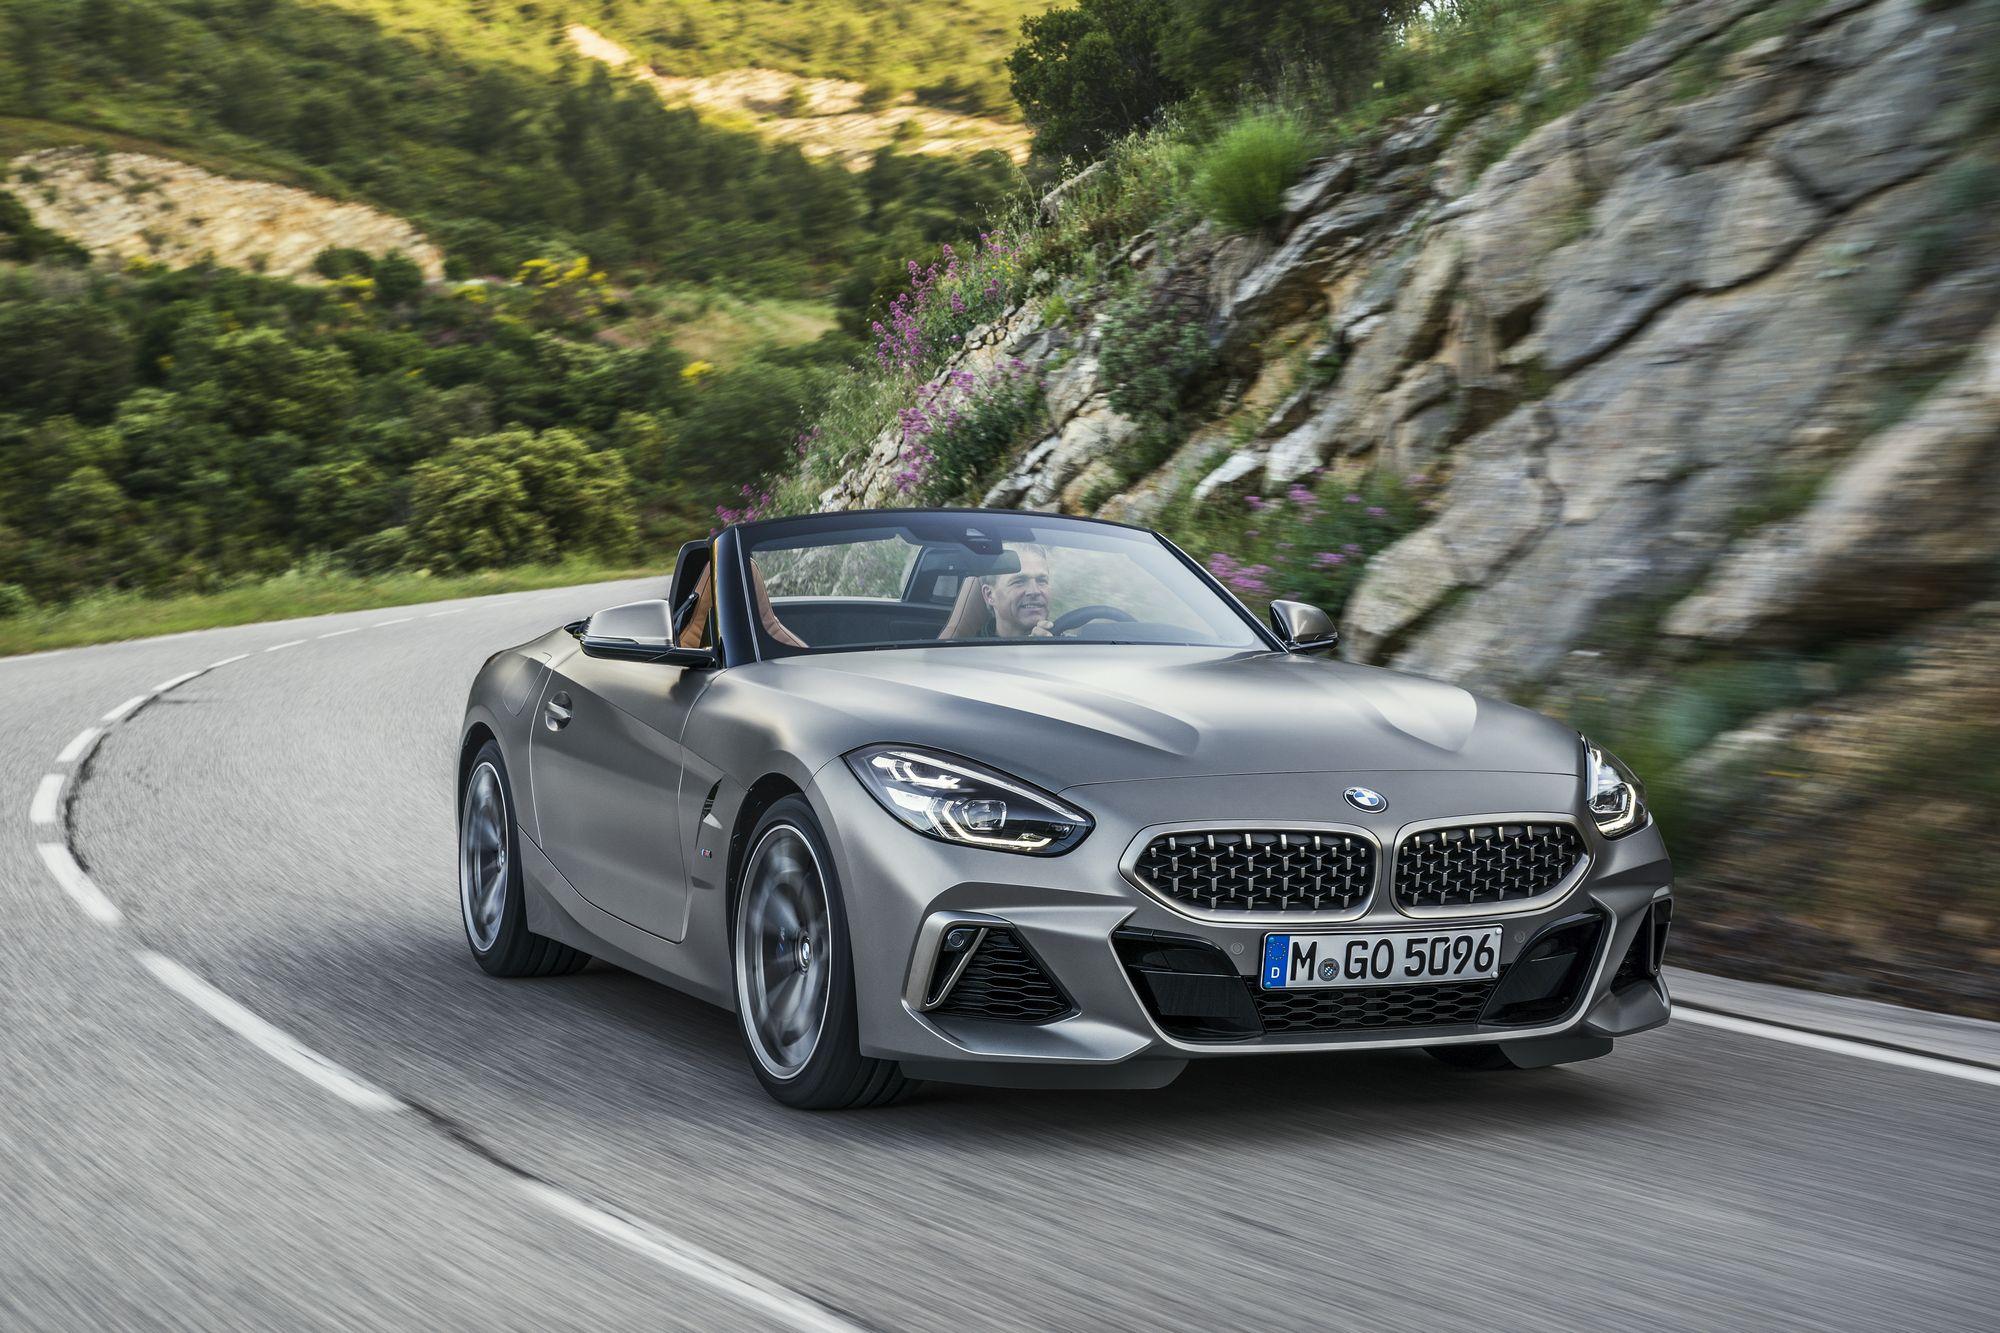 Noul BMW Z4 – Trei versiuni noi vin în 2019